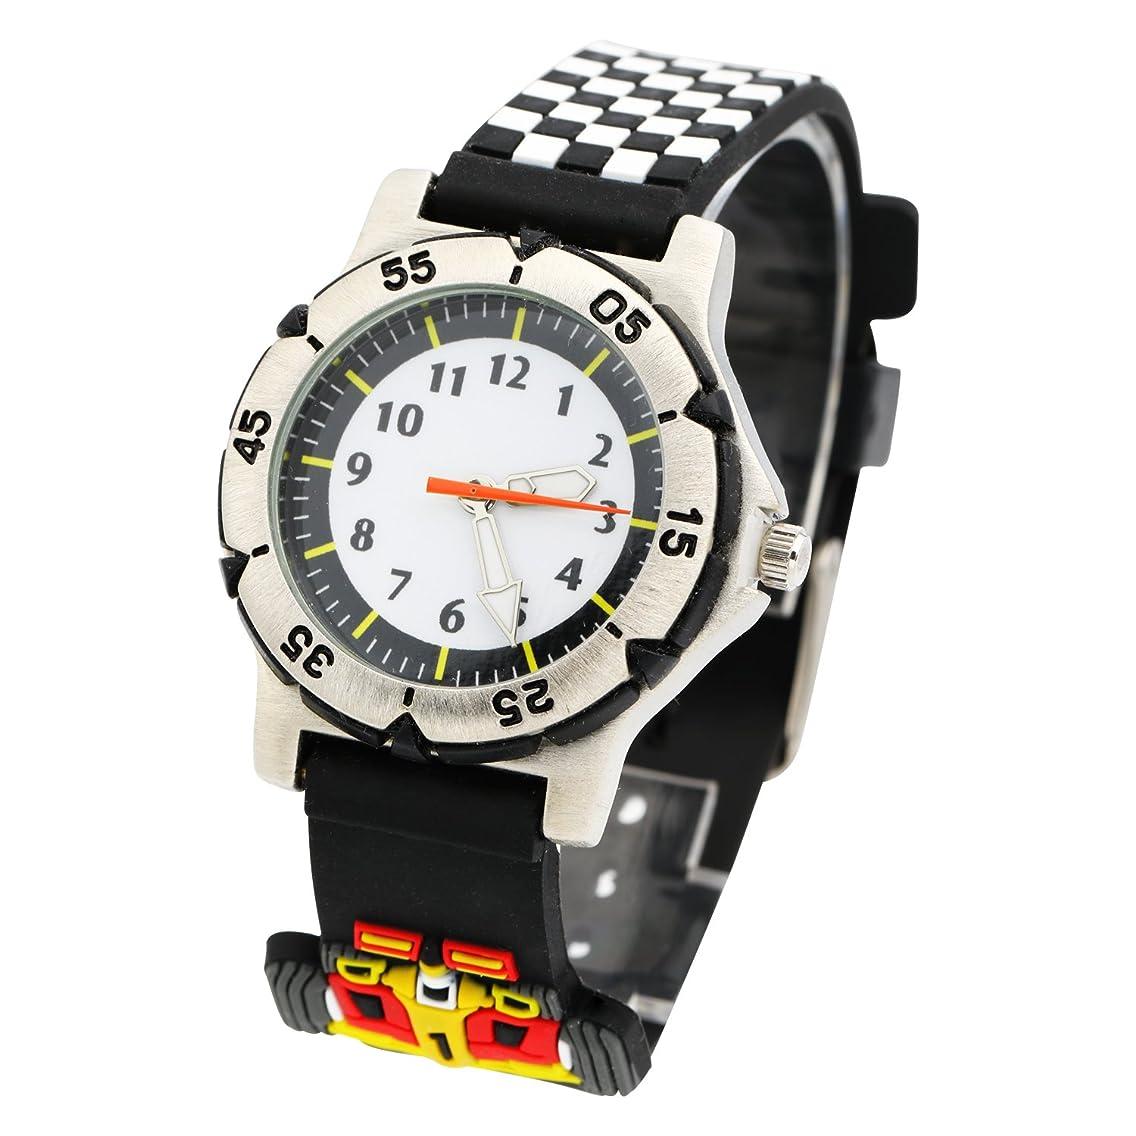 ELEOPTION Waterproof Boys Girls Kids Watches Fashion Cartoon Children Gift Analog Quartz Cute Wristwatch Box (Racing Car- Black)